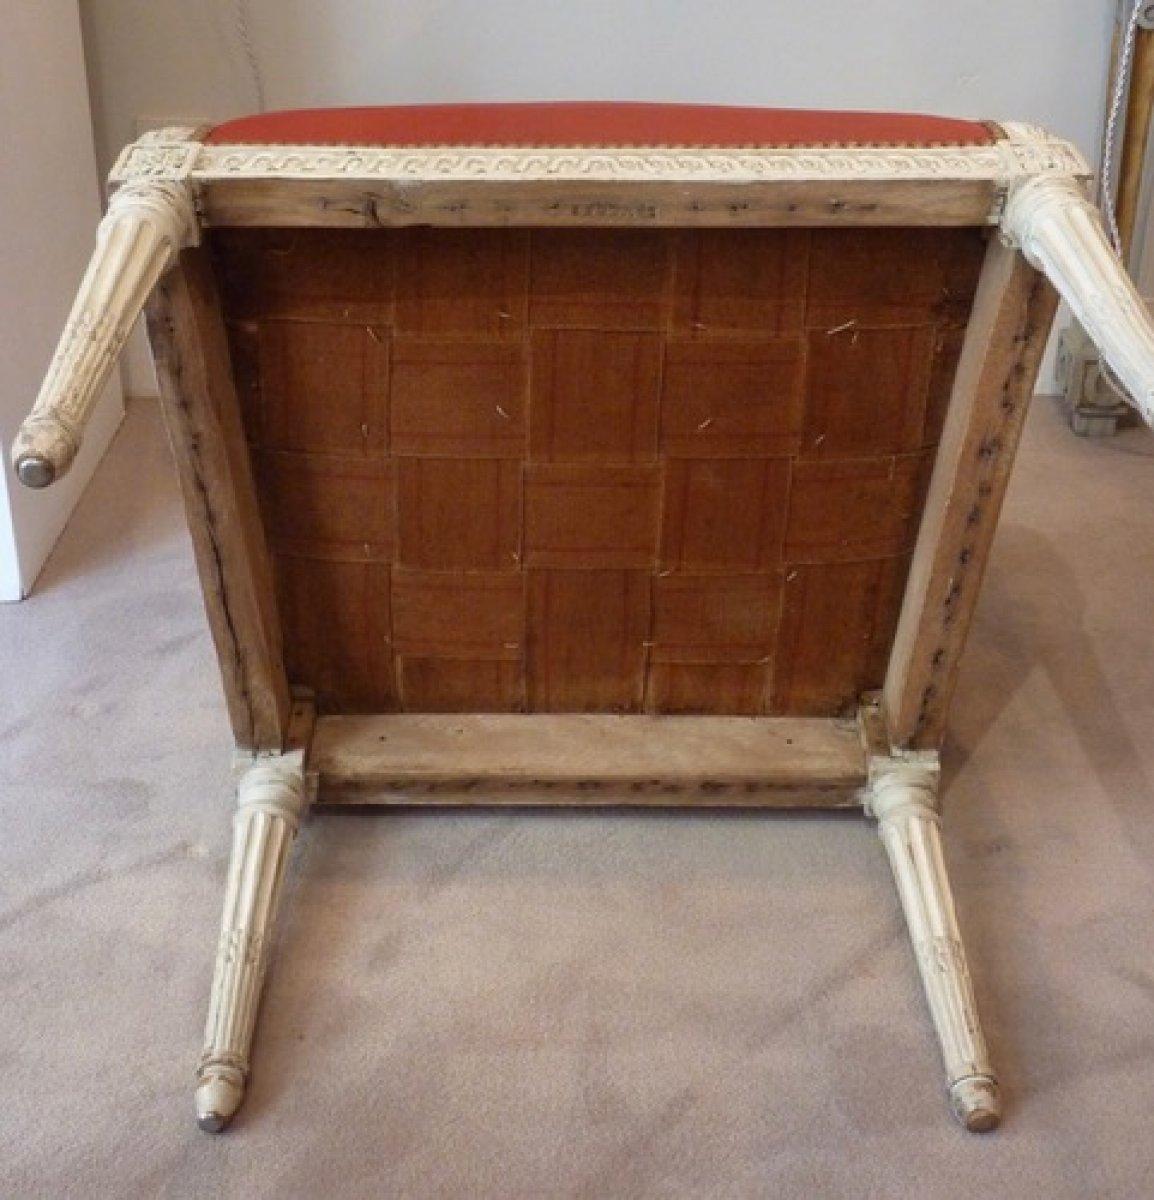 fauteuil de bureau d 39 poque louis xvi estampill i avisse xviiie si cl. Black Bedroom Furniture Sets. Home Design Ideas